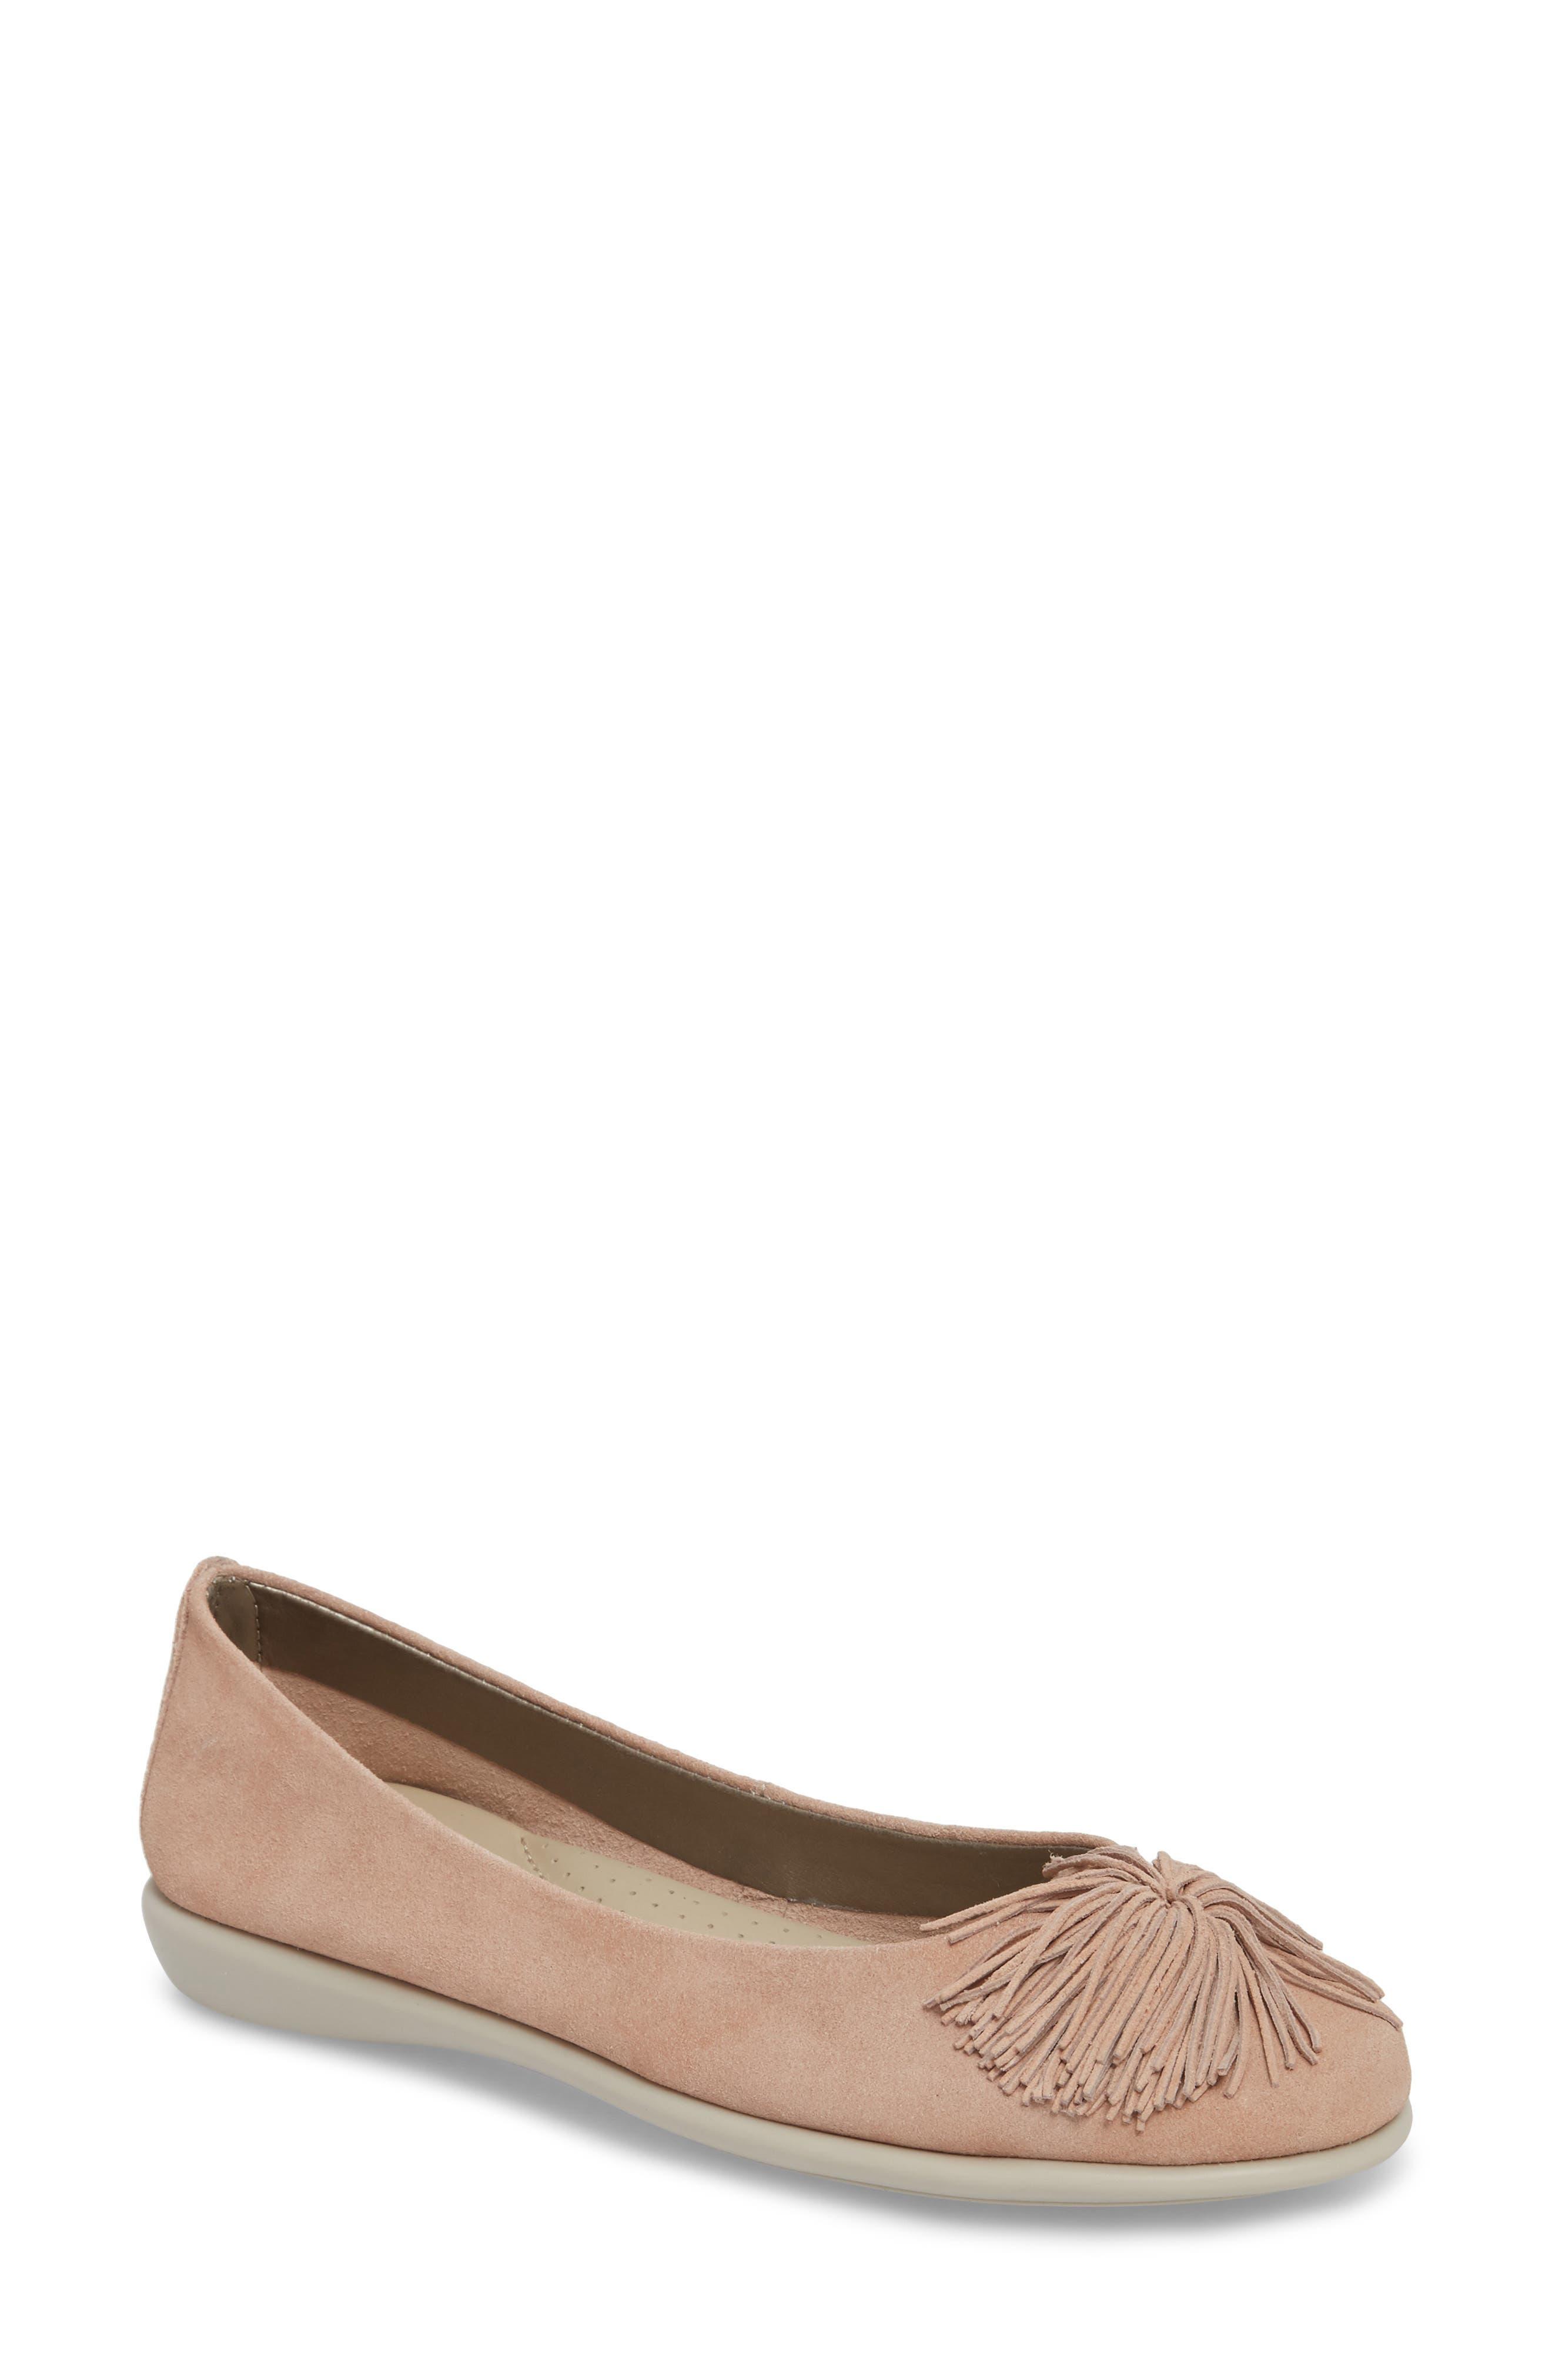 a1937a736a pom pom shoes